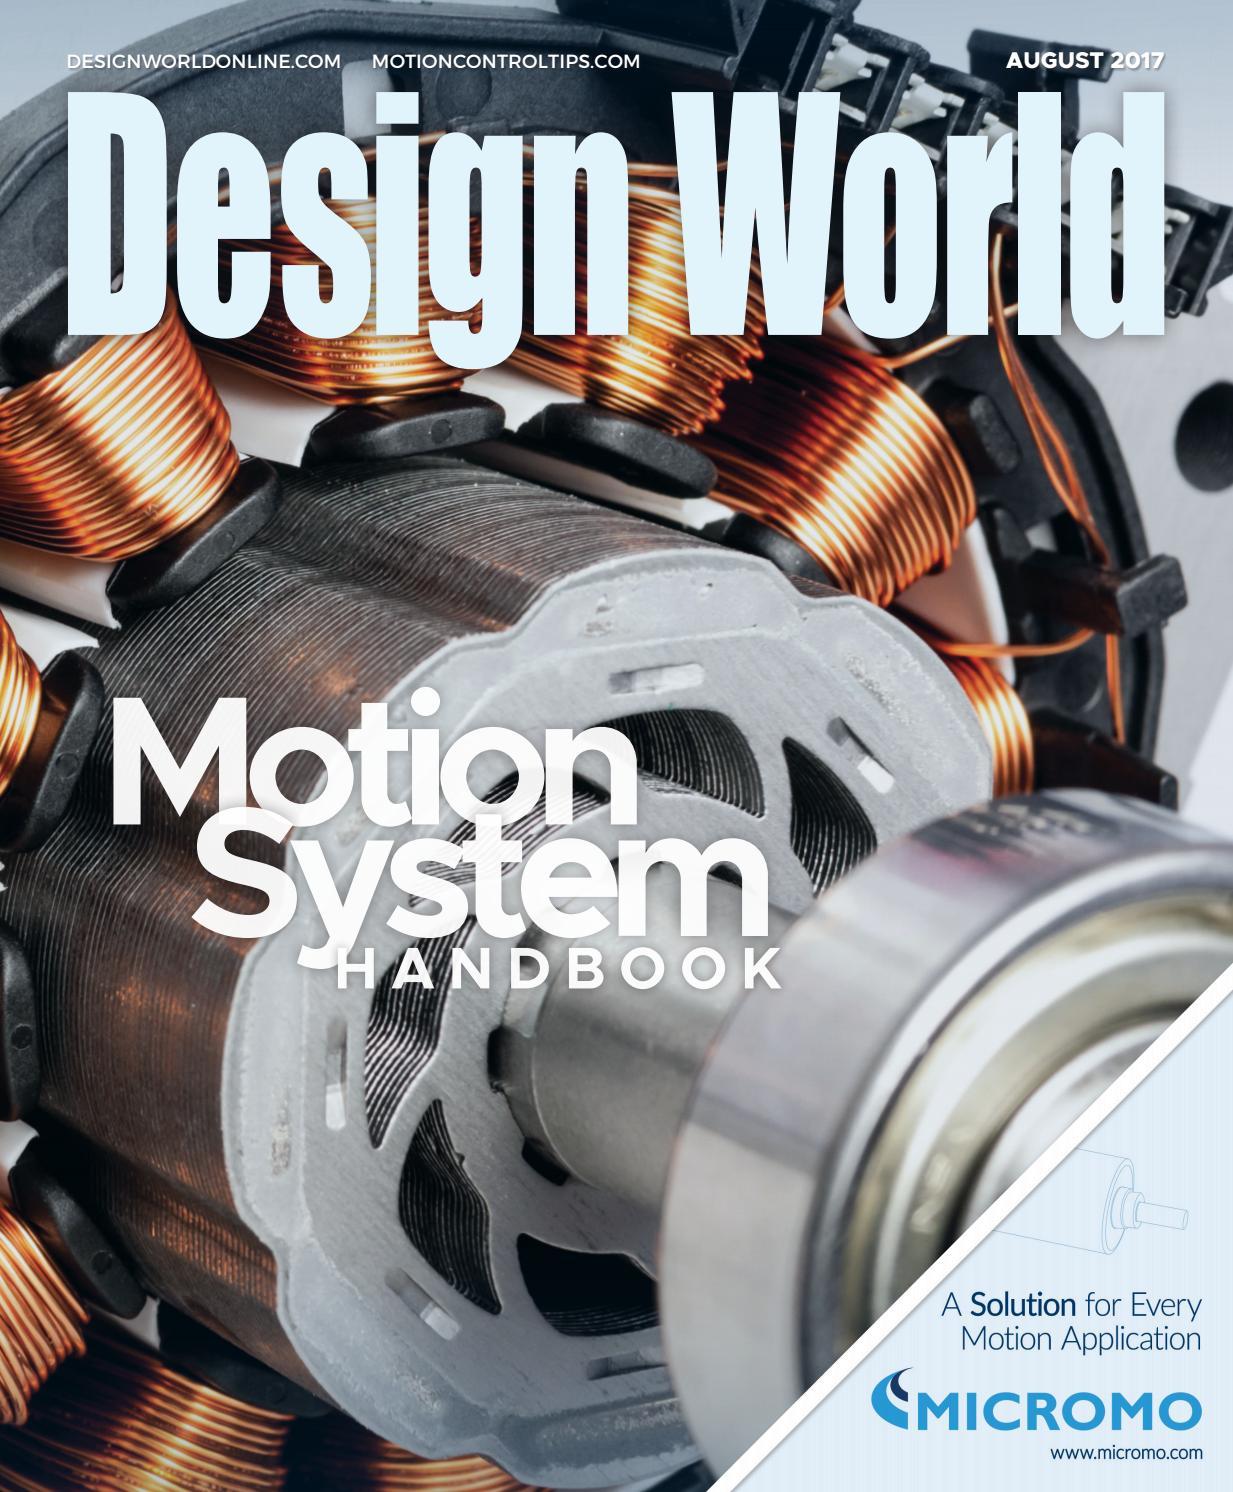 New 10 Sets TO-220 Heatsink TO-126 Transistor Heat Sink atural Aluminium Screw+Washer+Insulator Rubberized Silicone+ Heatsink